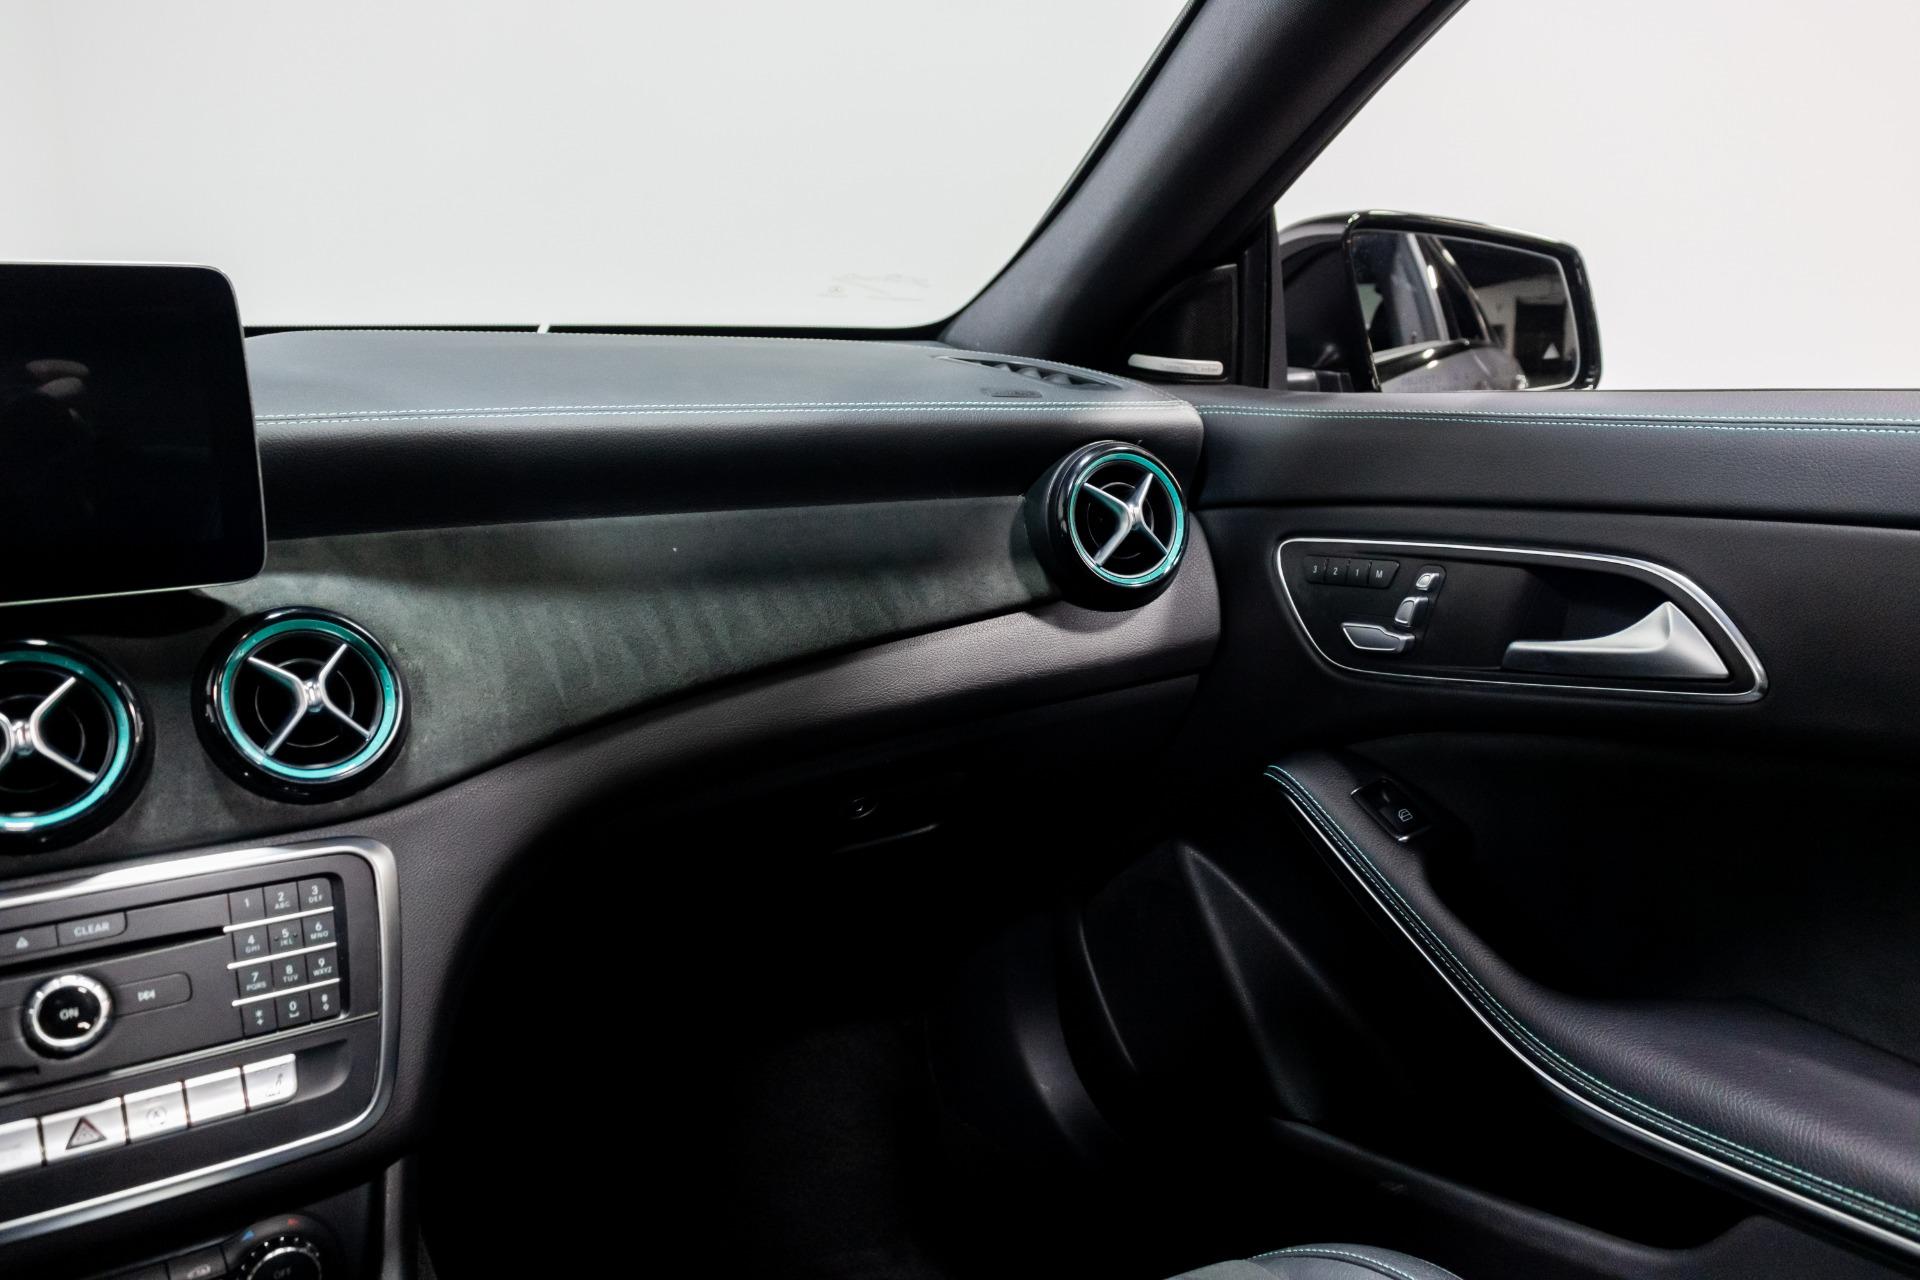 Used 2017 Mercedes Benz CLA CLA 250 4MATIC